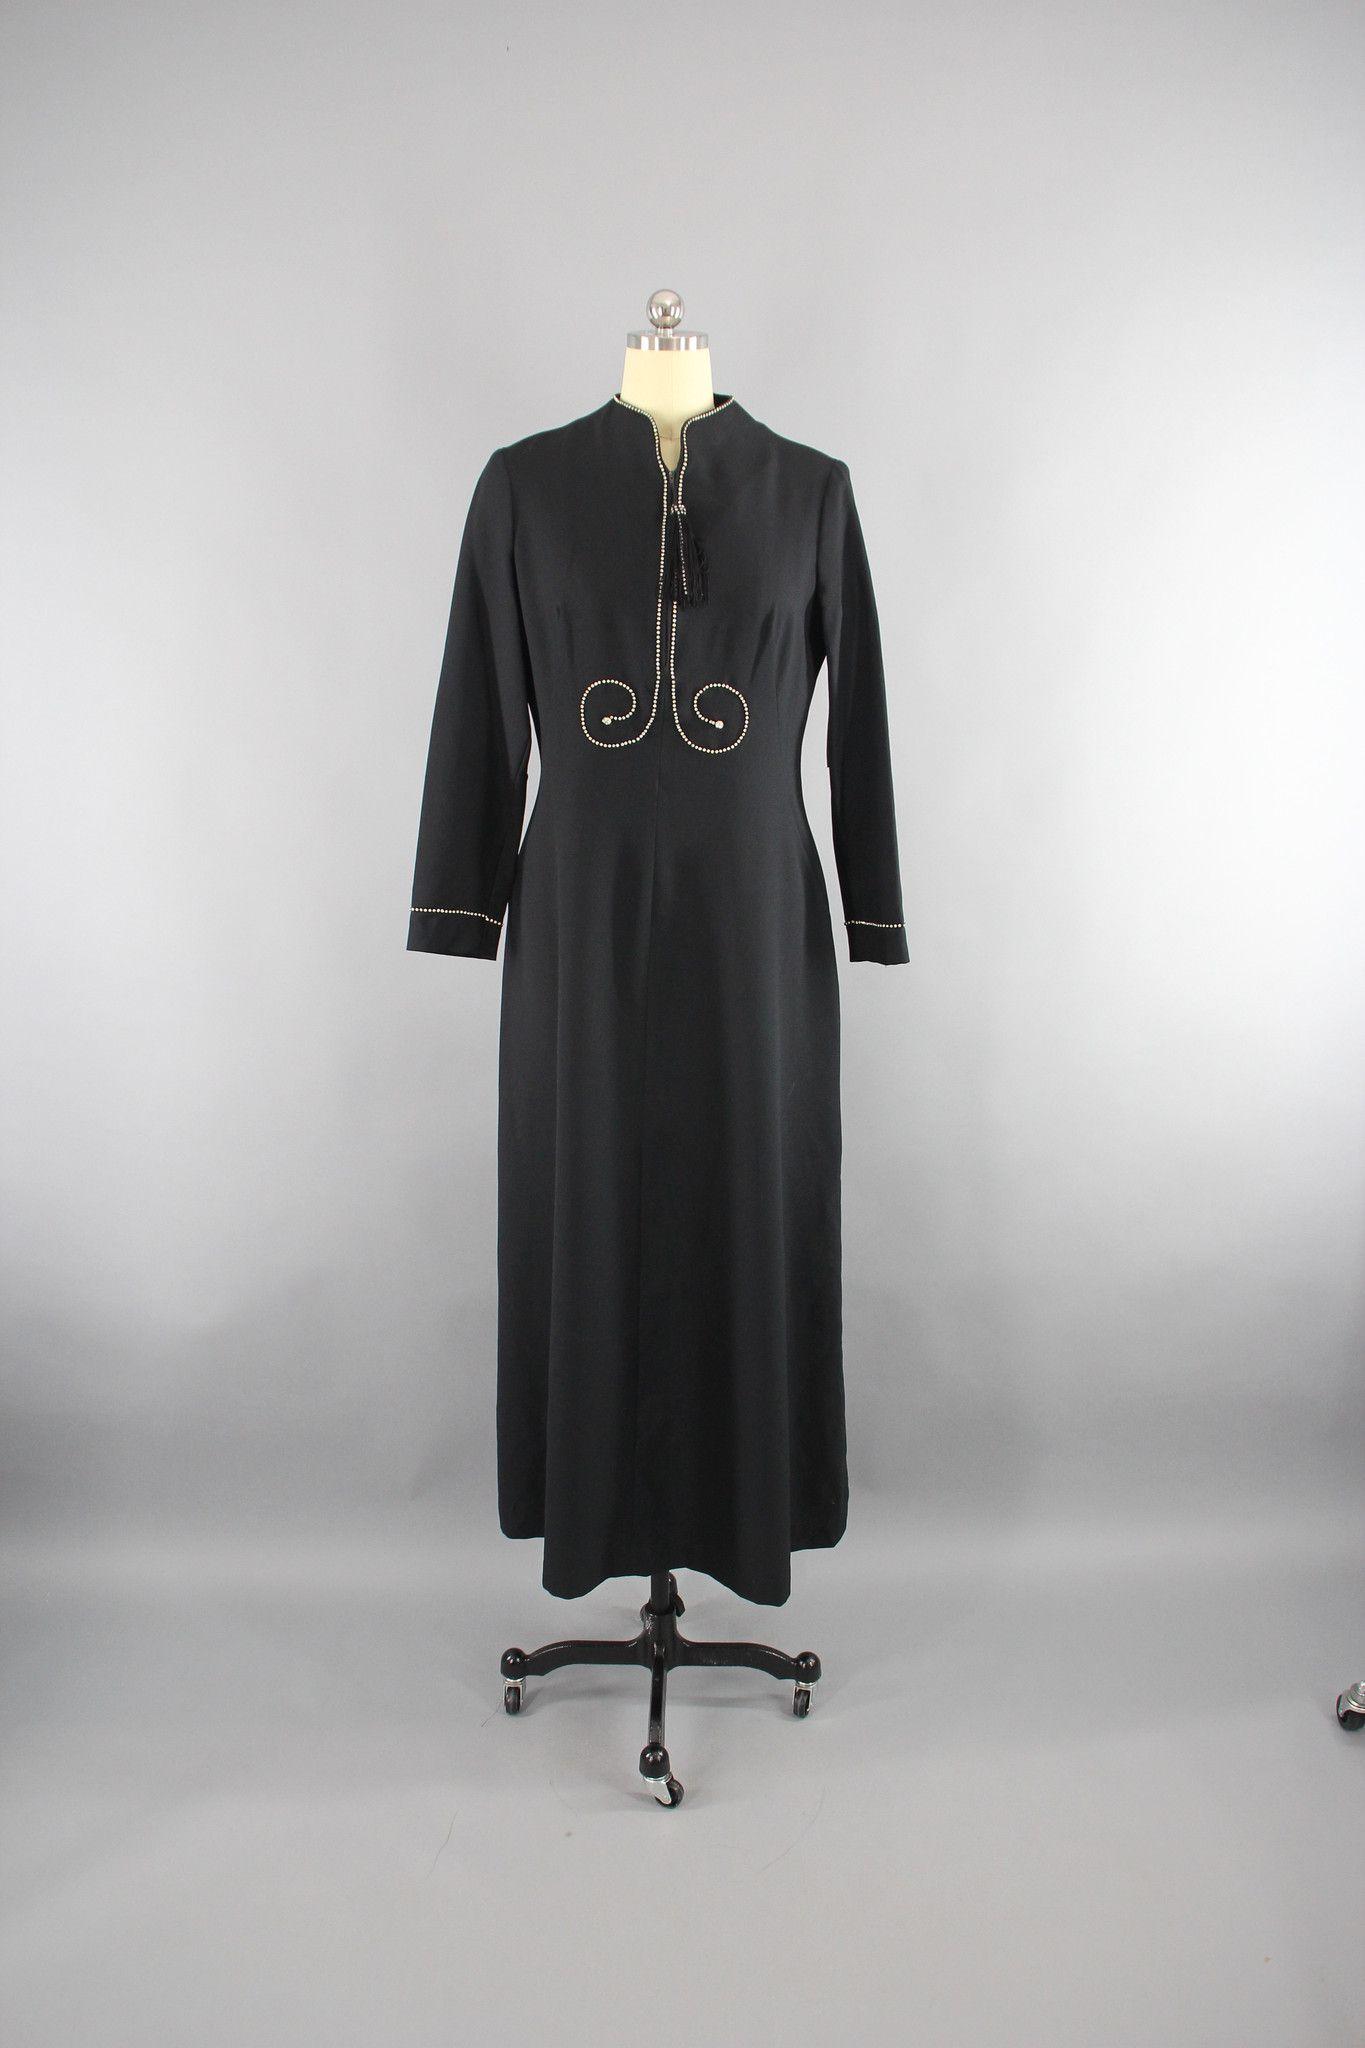 S vintage maxi dress with rhinestones and fringe thisbluebird